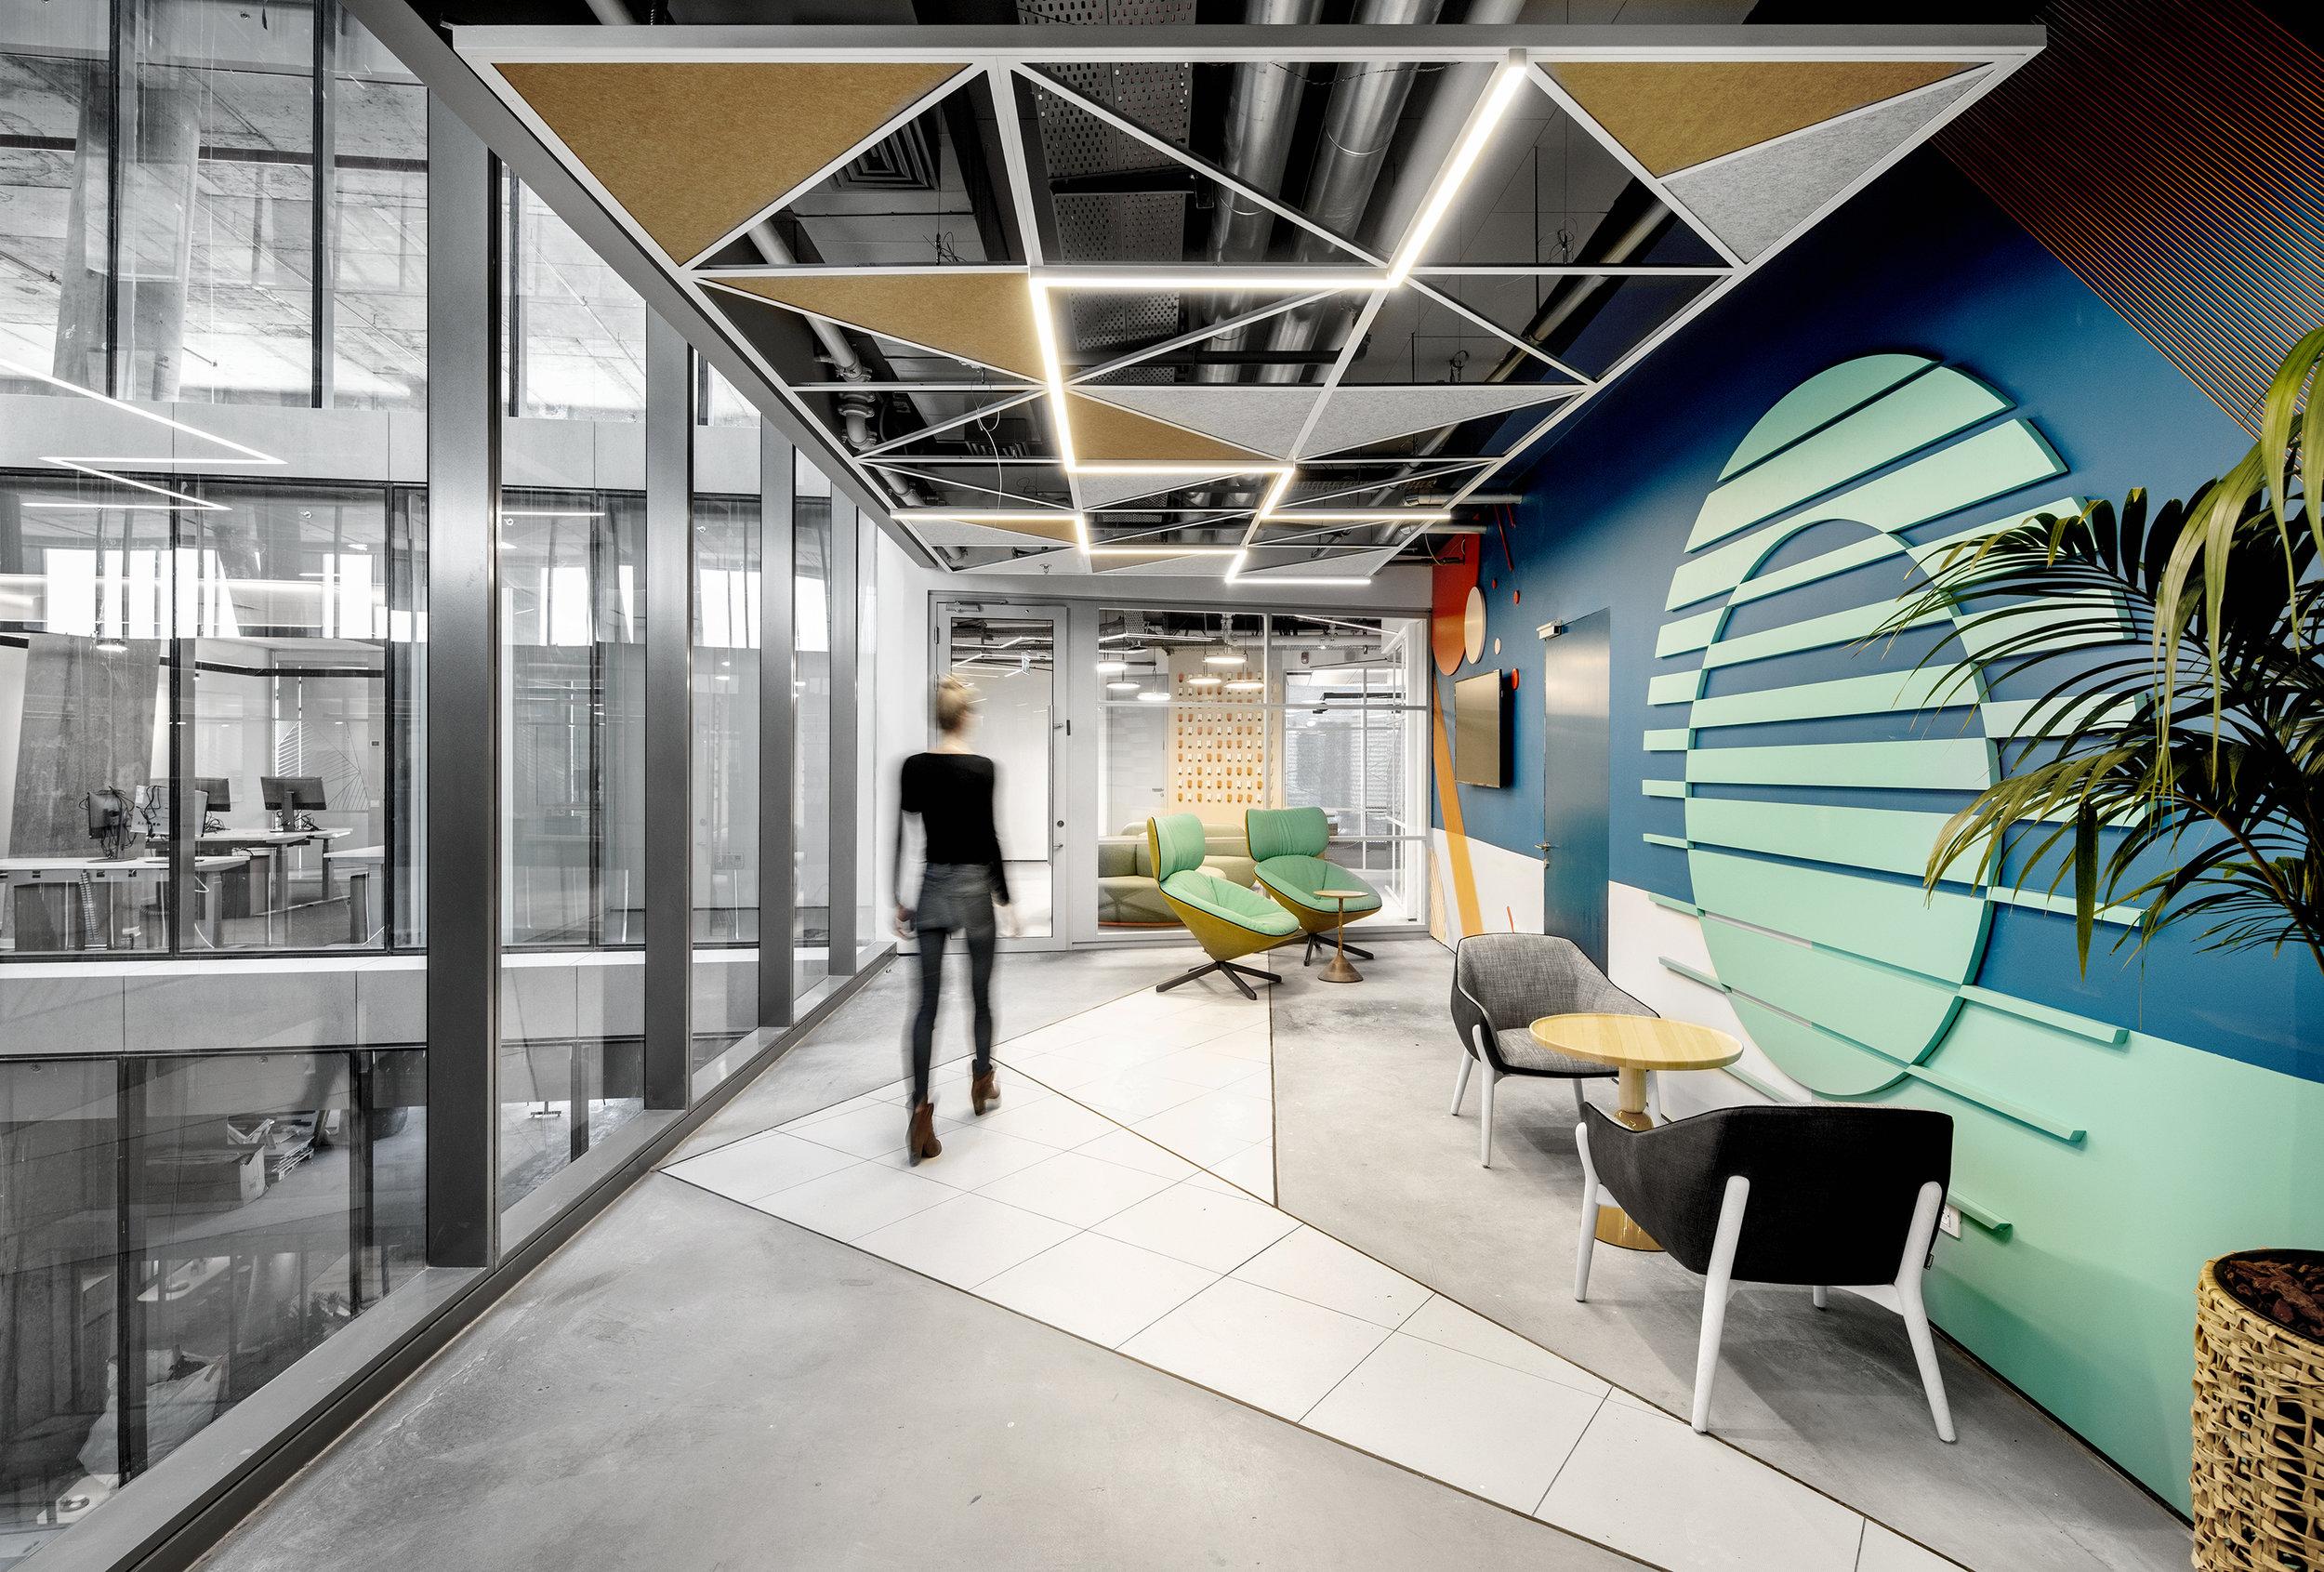 AKAMAI - ROY DAVID ARCHITECTURE - STUDIO - רואי דוד אדריכלות - אדריכלים - סטודיו - אקמאי (7).jpg